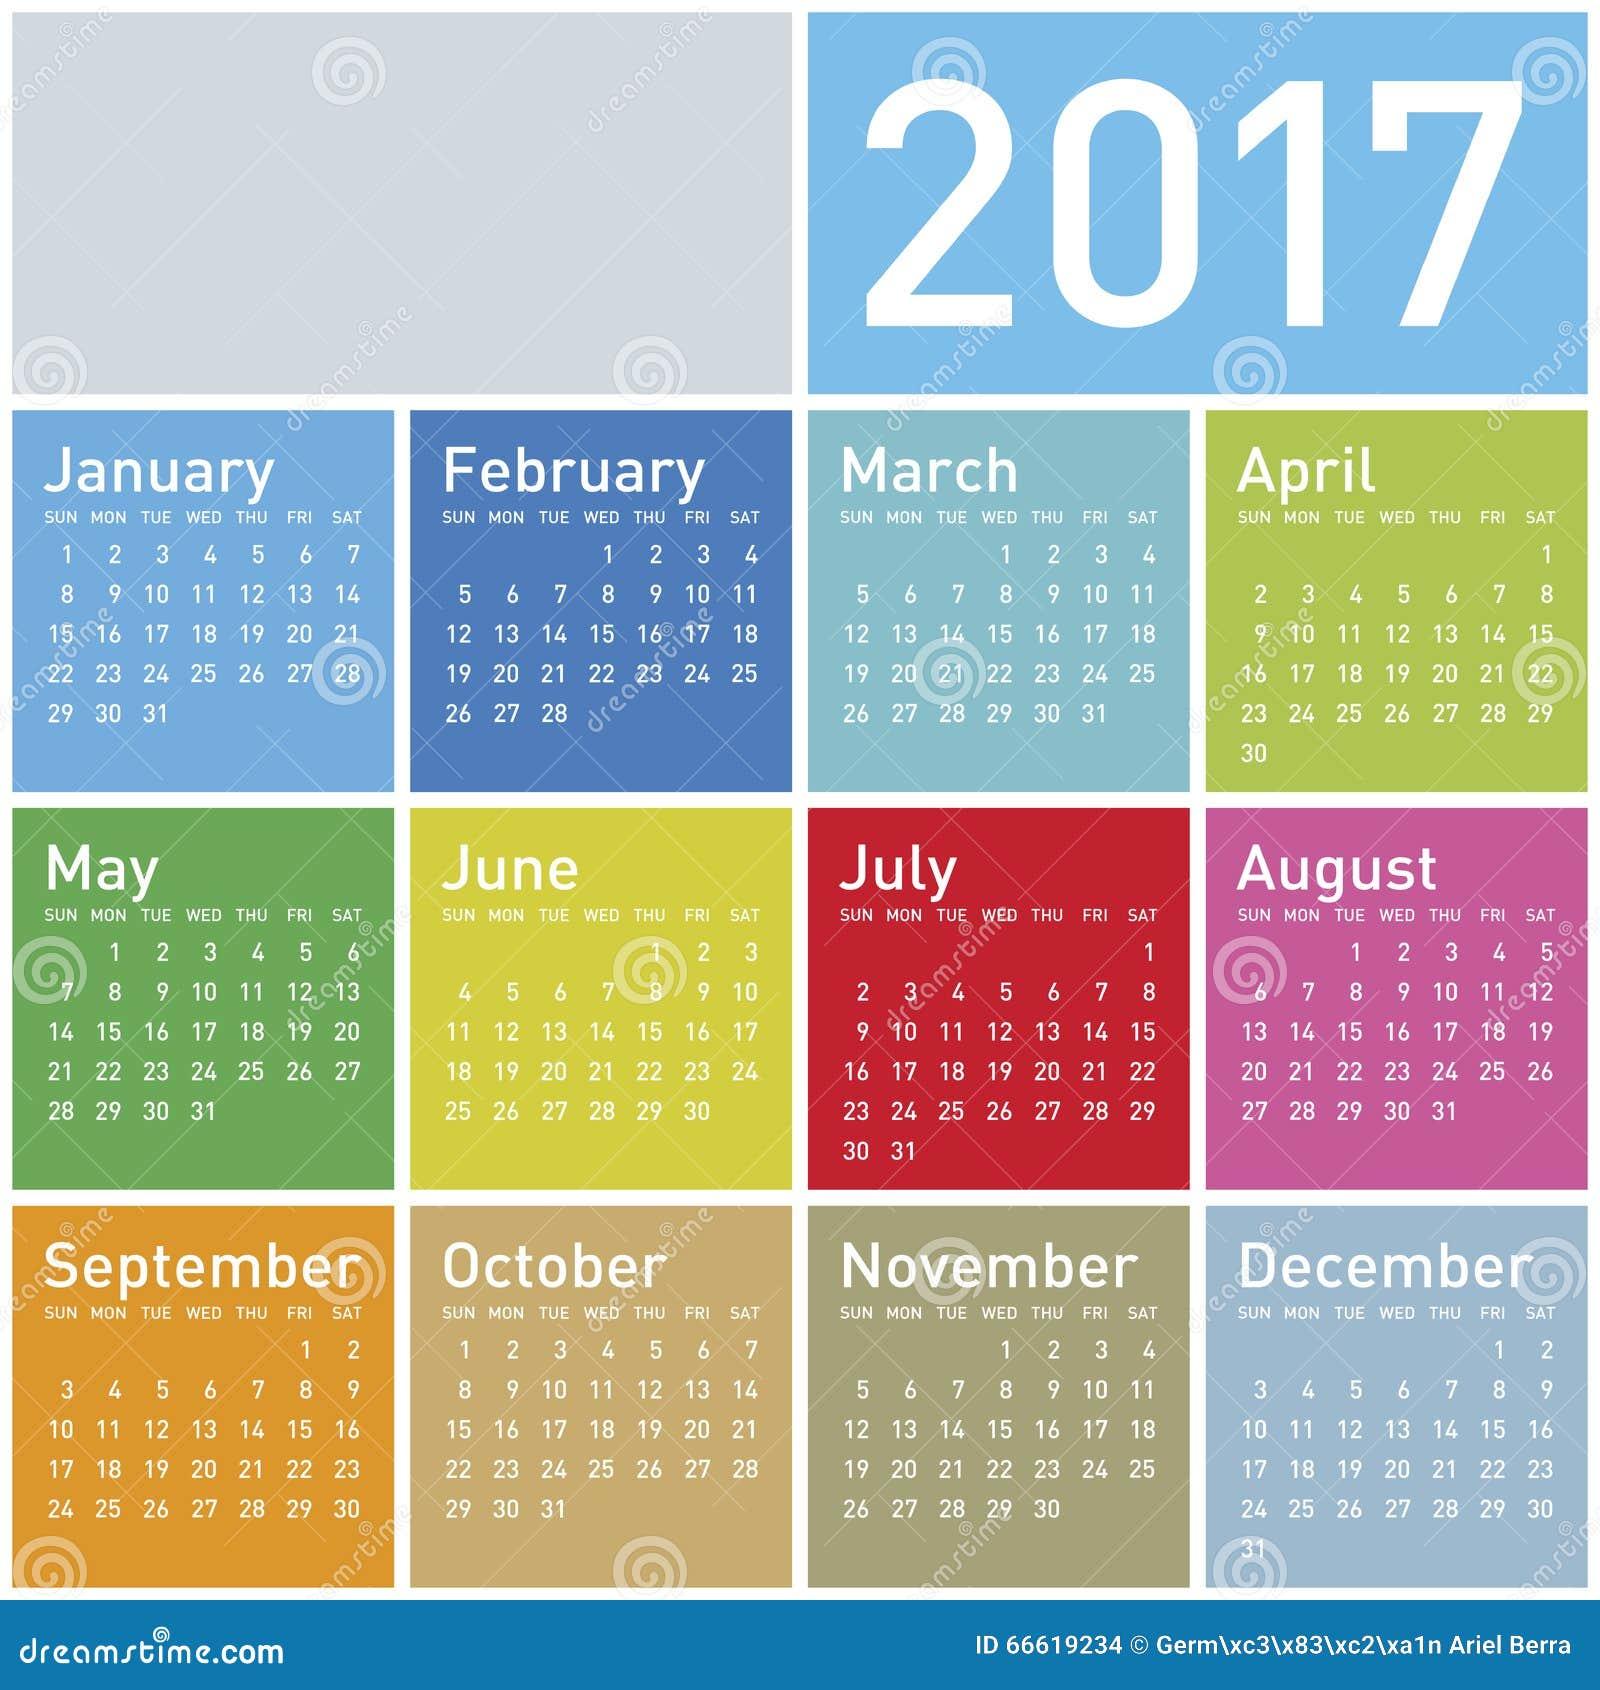 colorful calendar for year 2017 in vector format mr no pr no 3 733 6